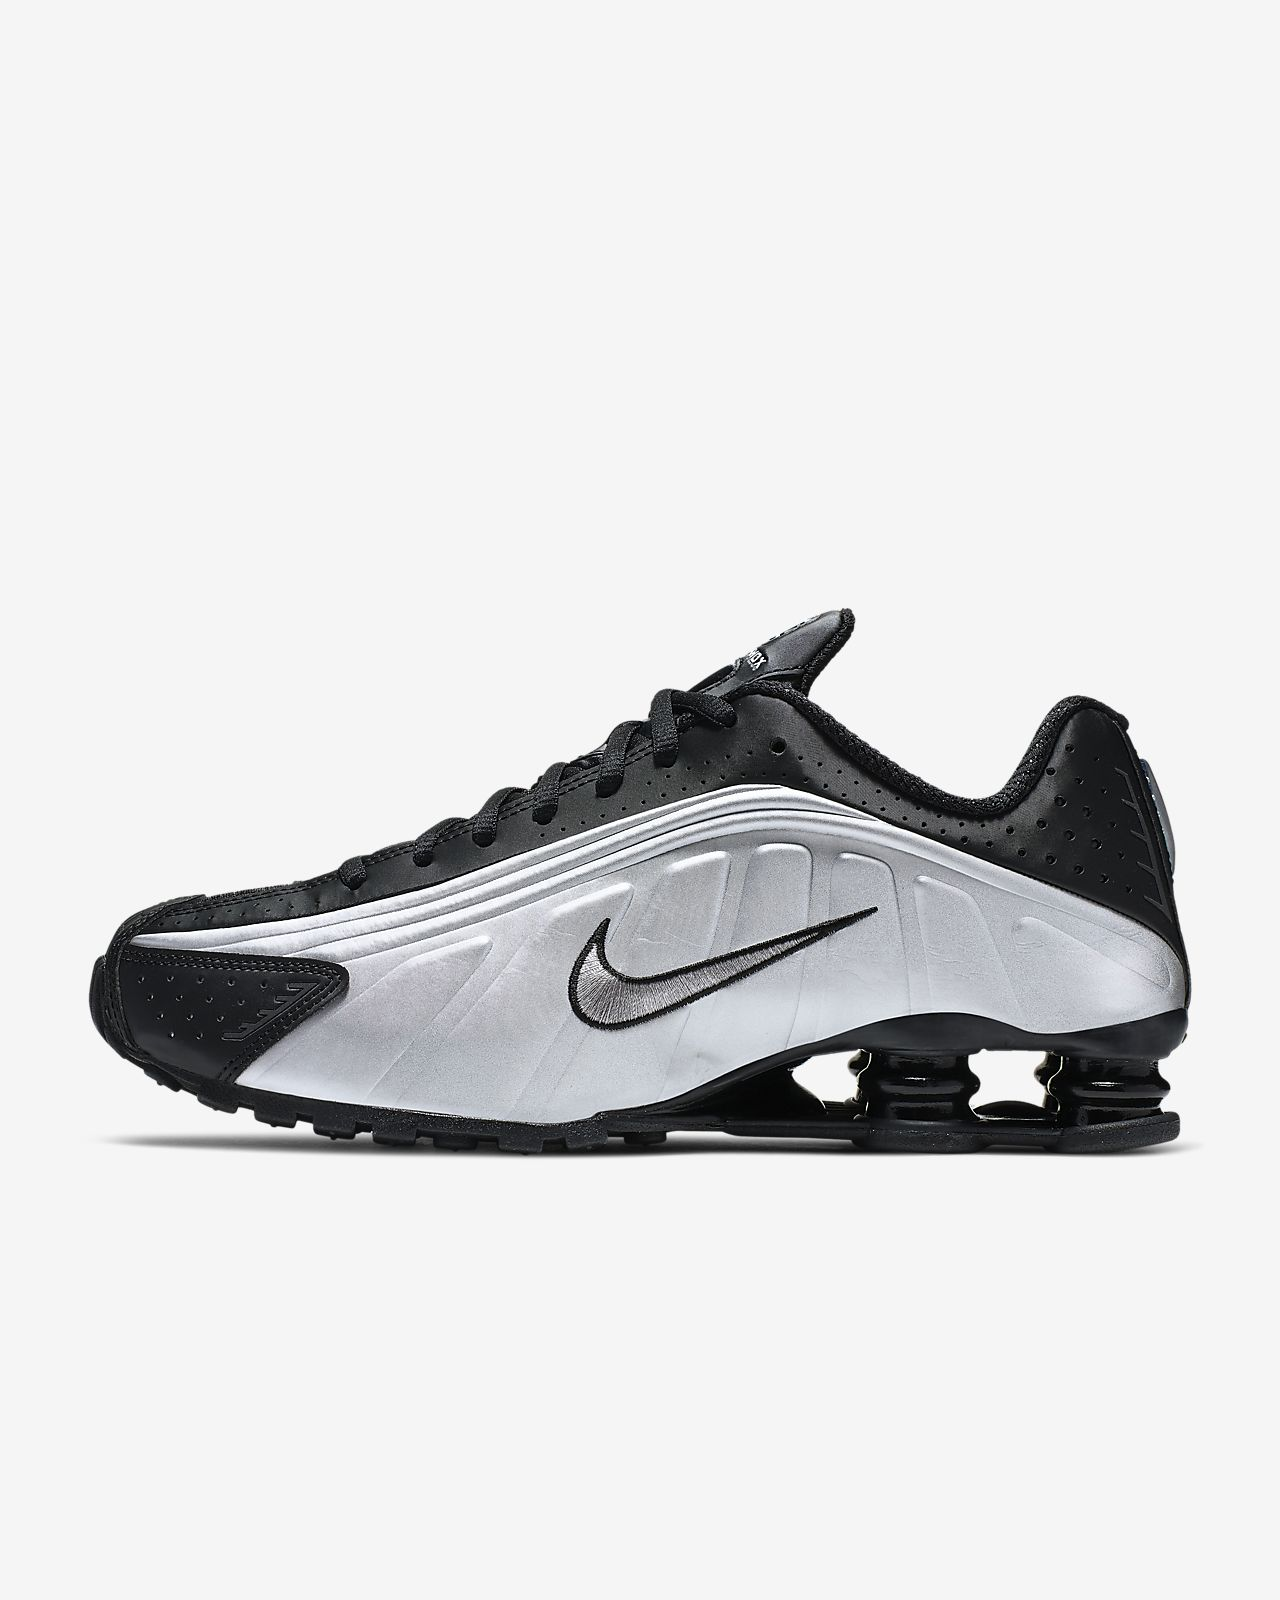 Chaussure Nike Shox R4 pour Homme